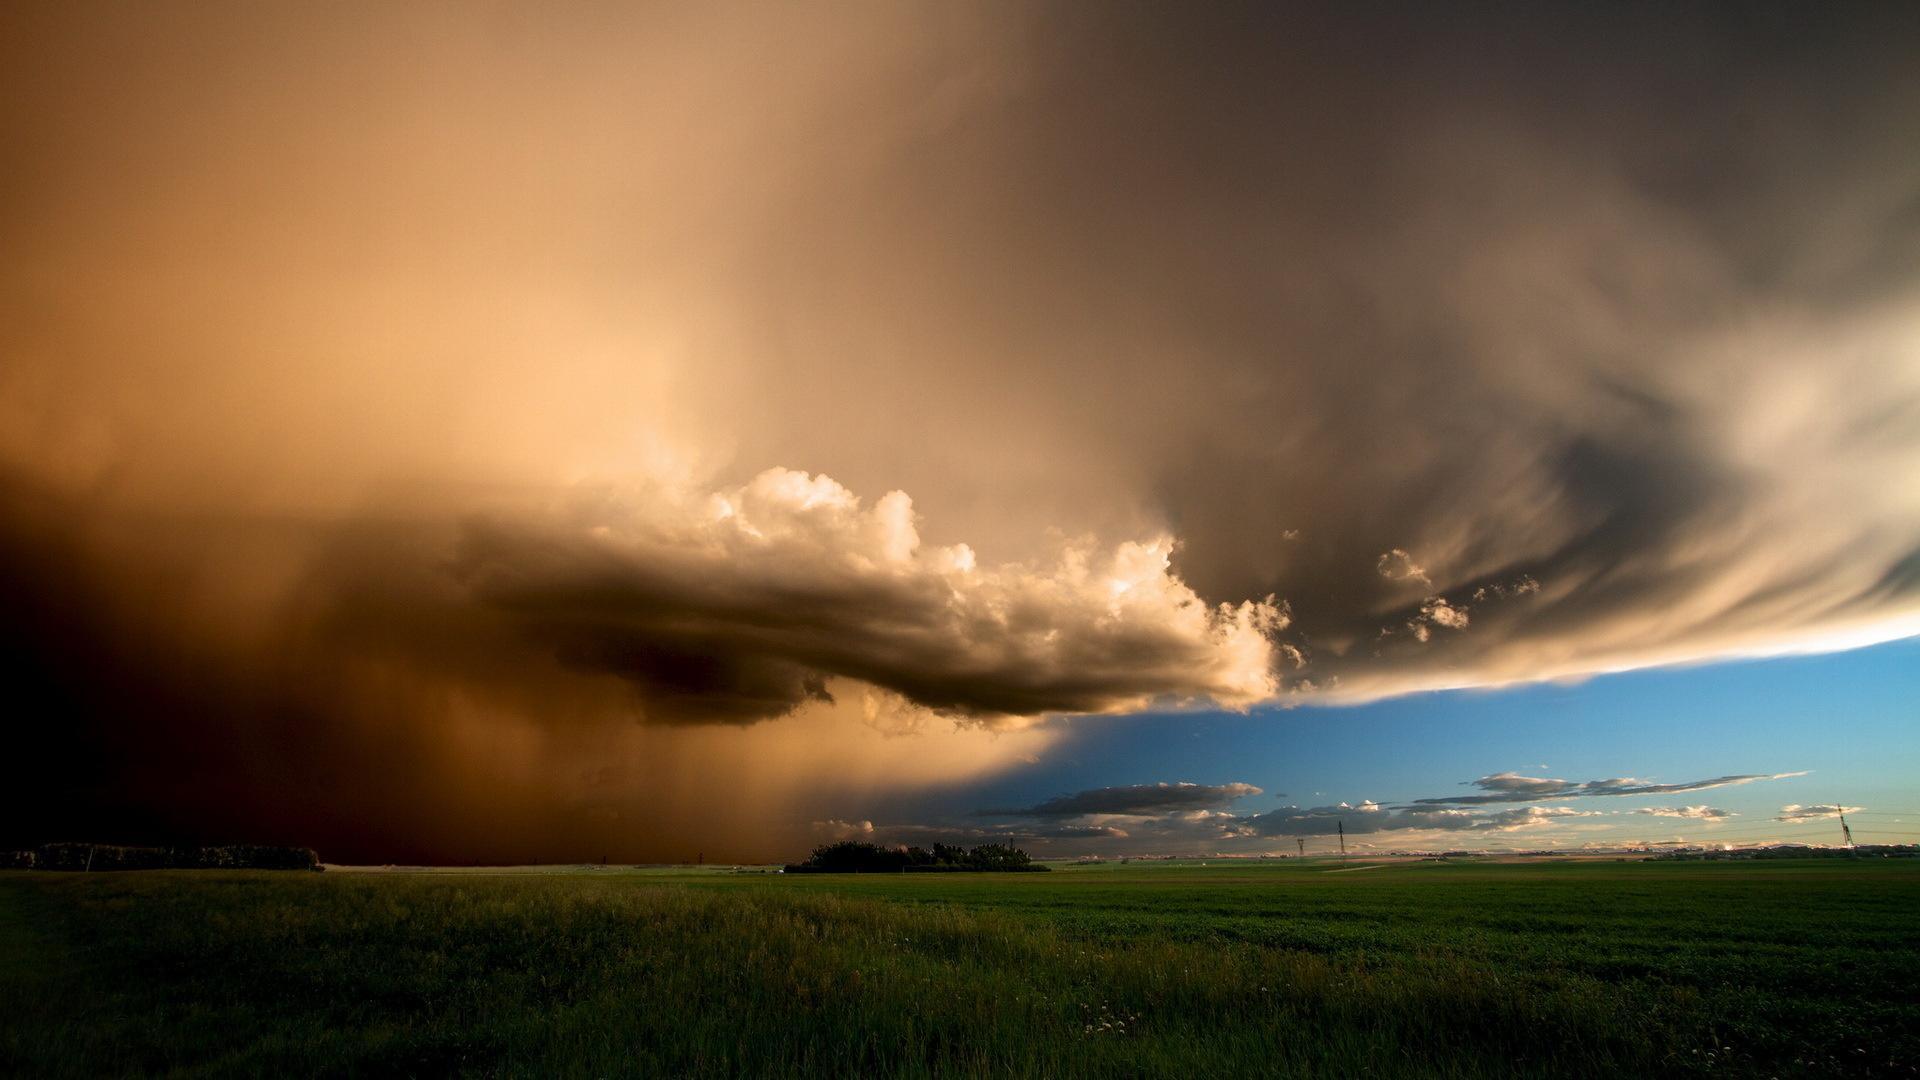 Storm Clouds 29528